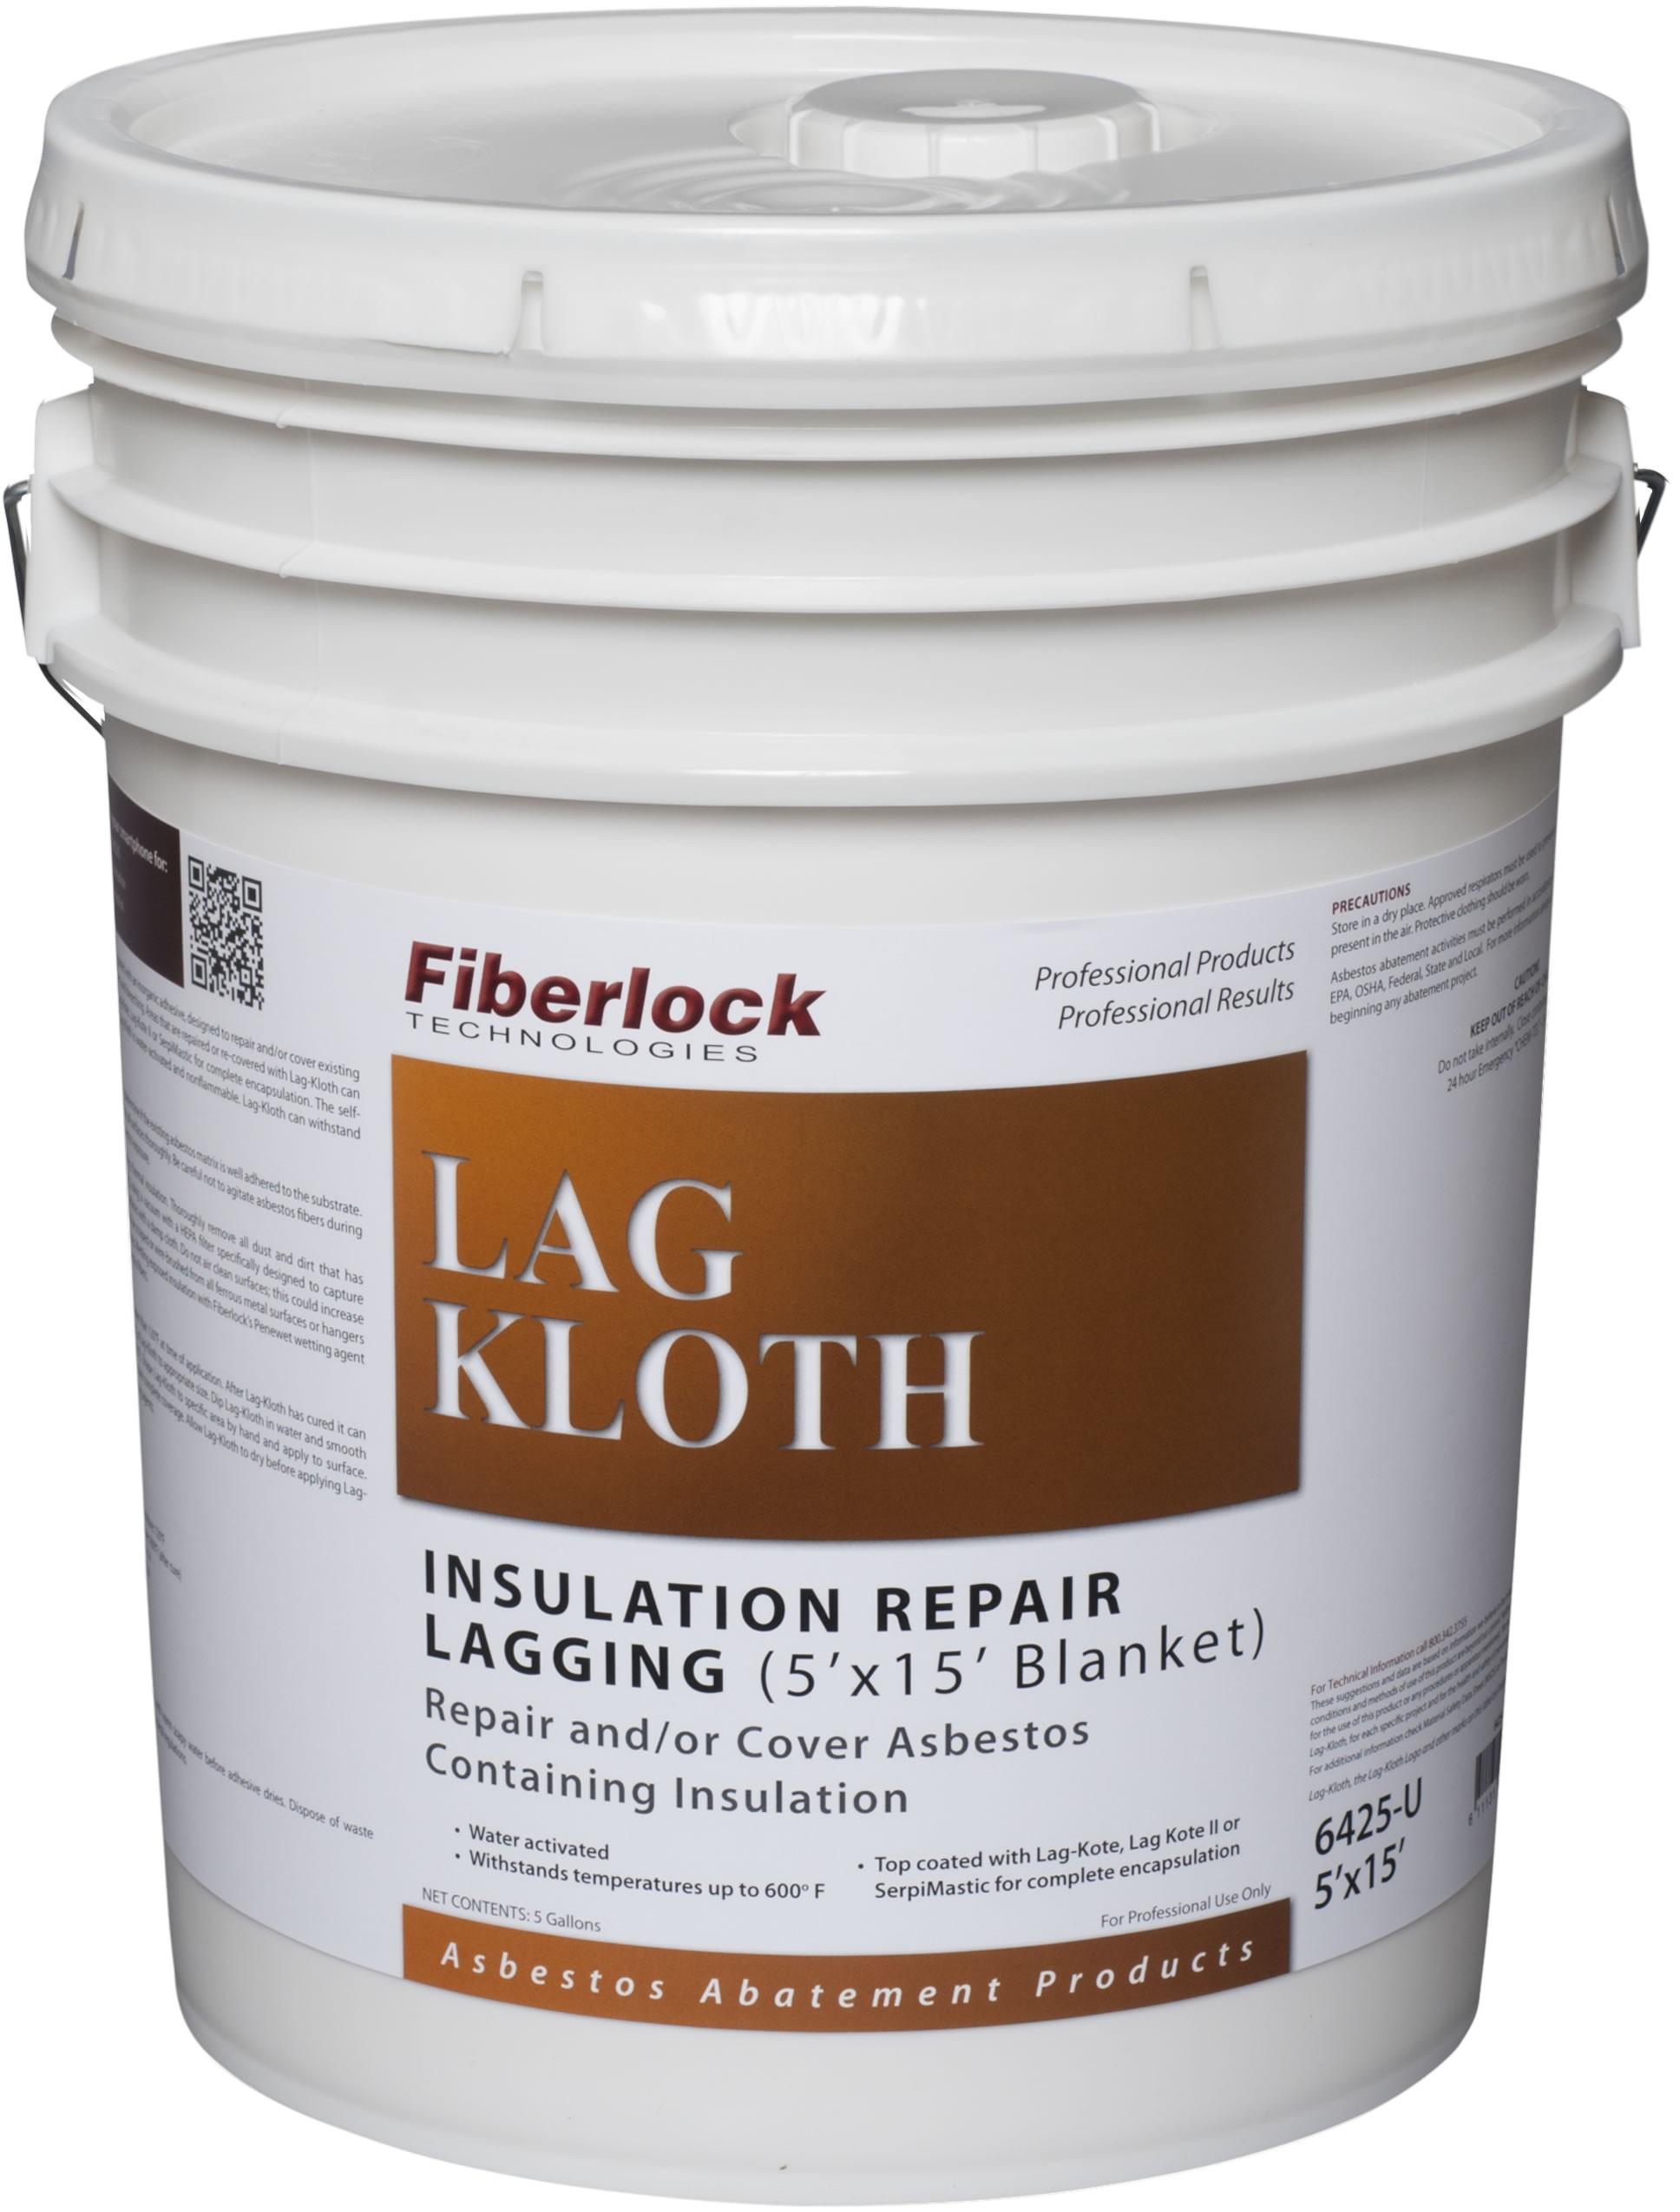 Fiberlock Lag-Kloth Water Activated Repair Cloth 5'x15' Blanket